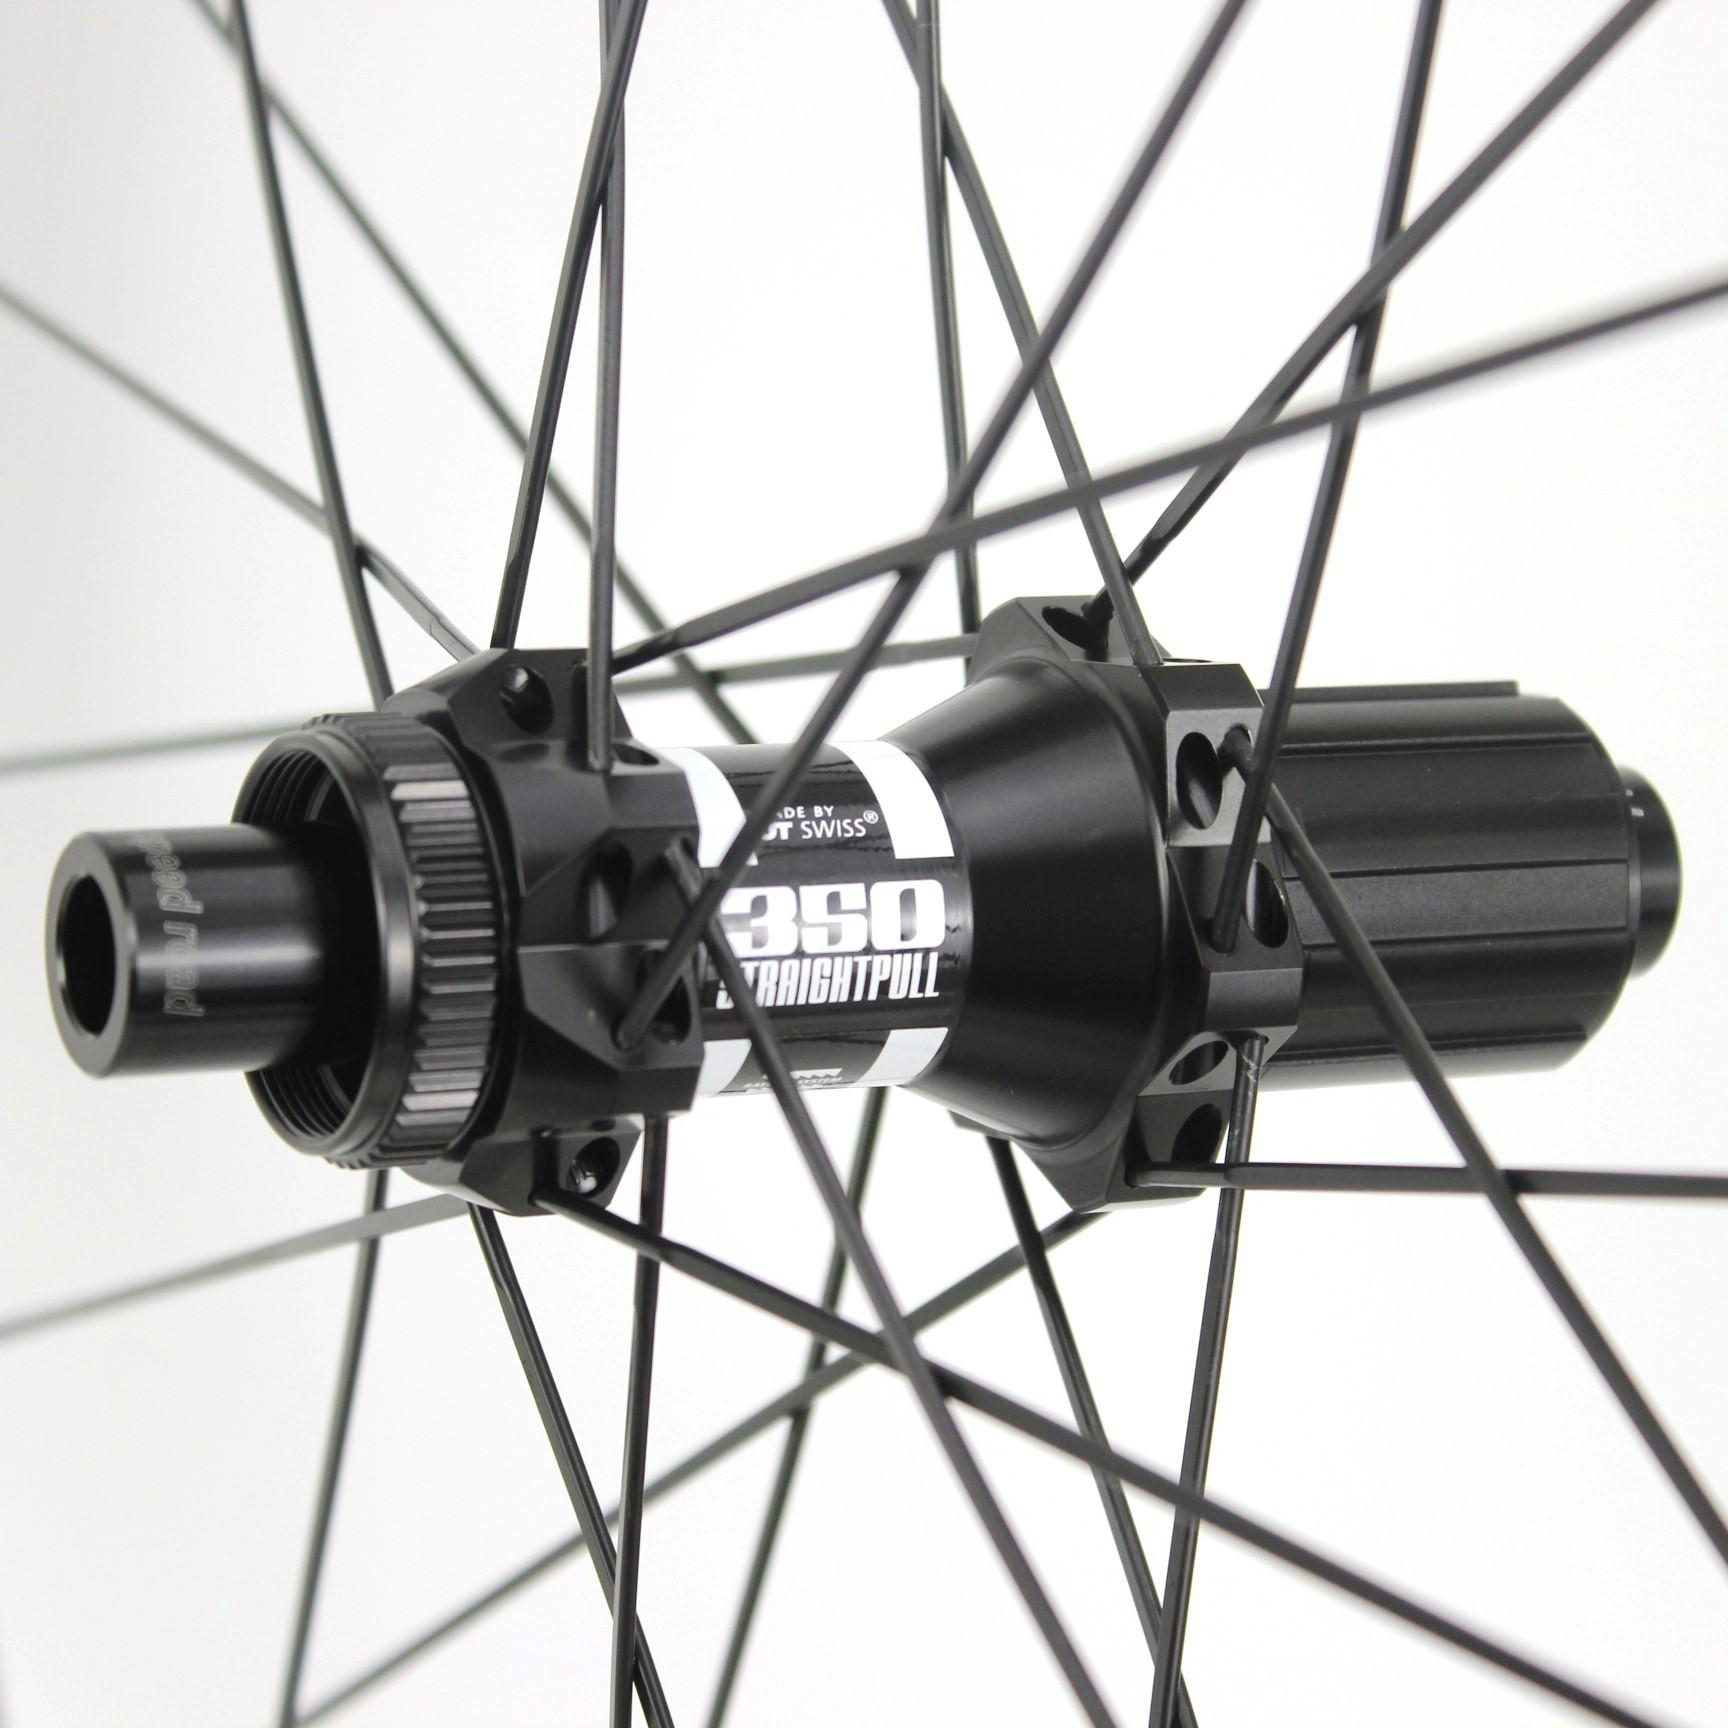 700C road disc wheelset 47mm rim depth sapim cx ray spokes